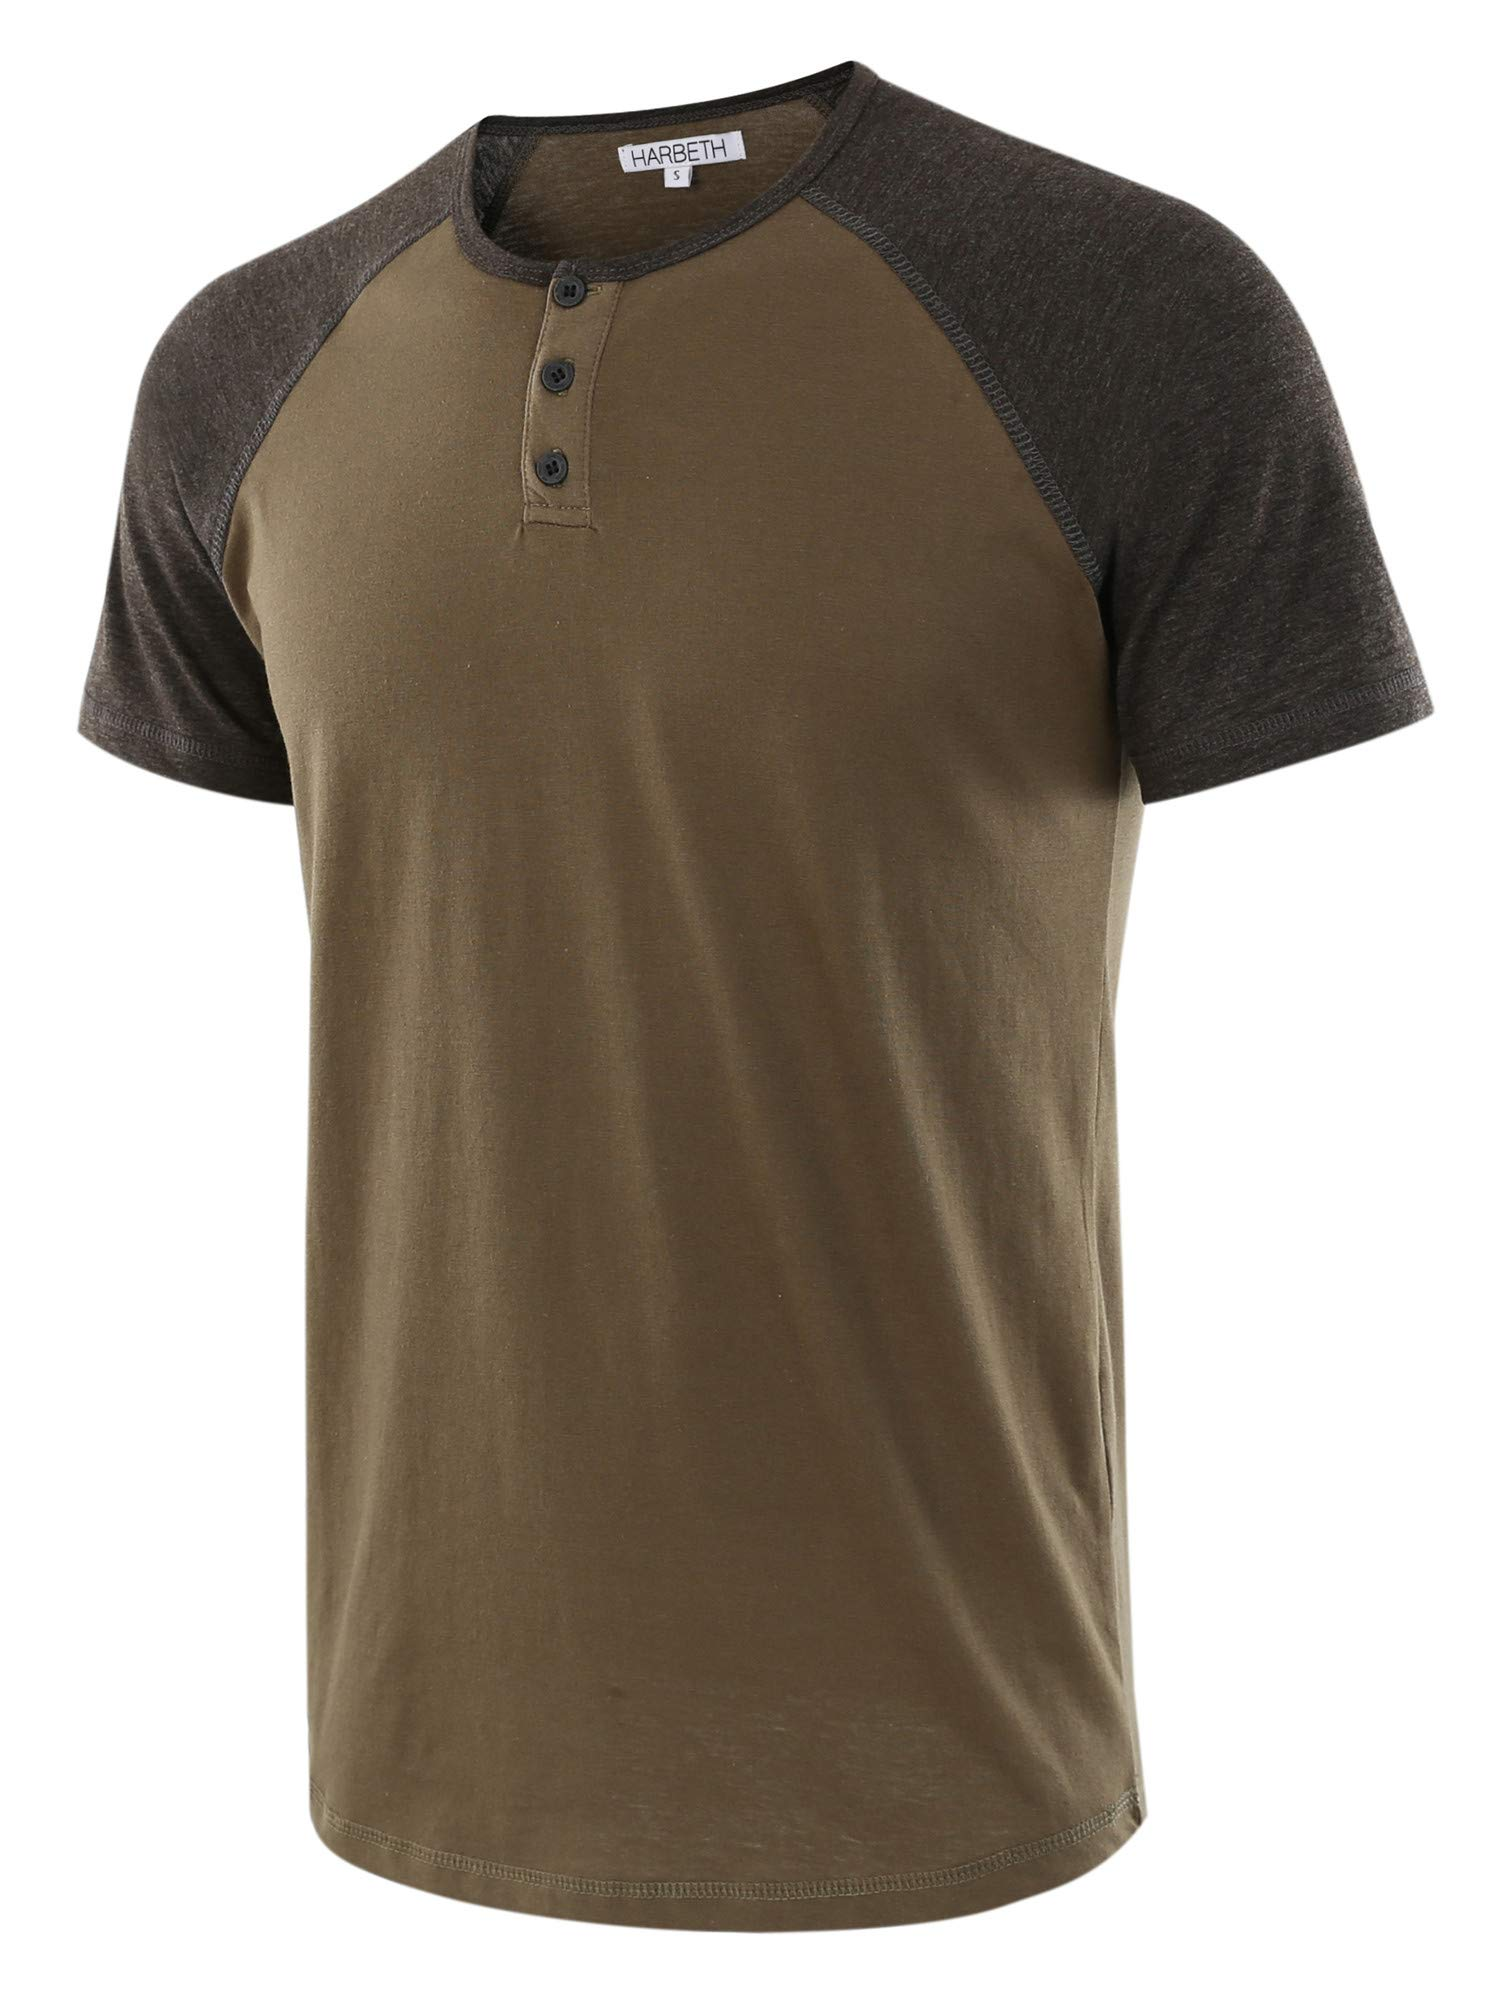 HARBETH Men's Casual Short Sleeve Henley Shirt Raglan Fit Baseball T-Shirts Tee Army/H.Charcoal M